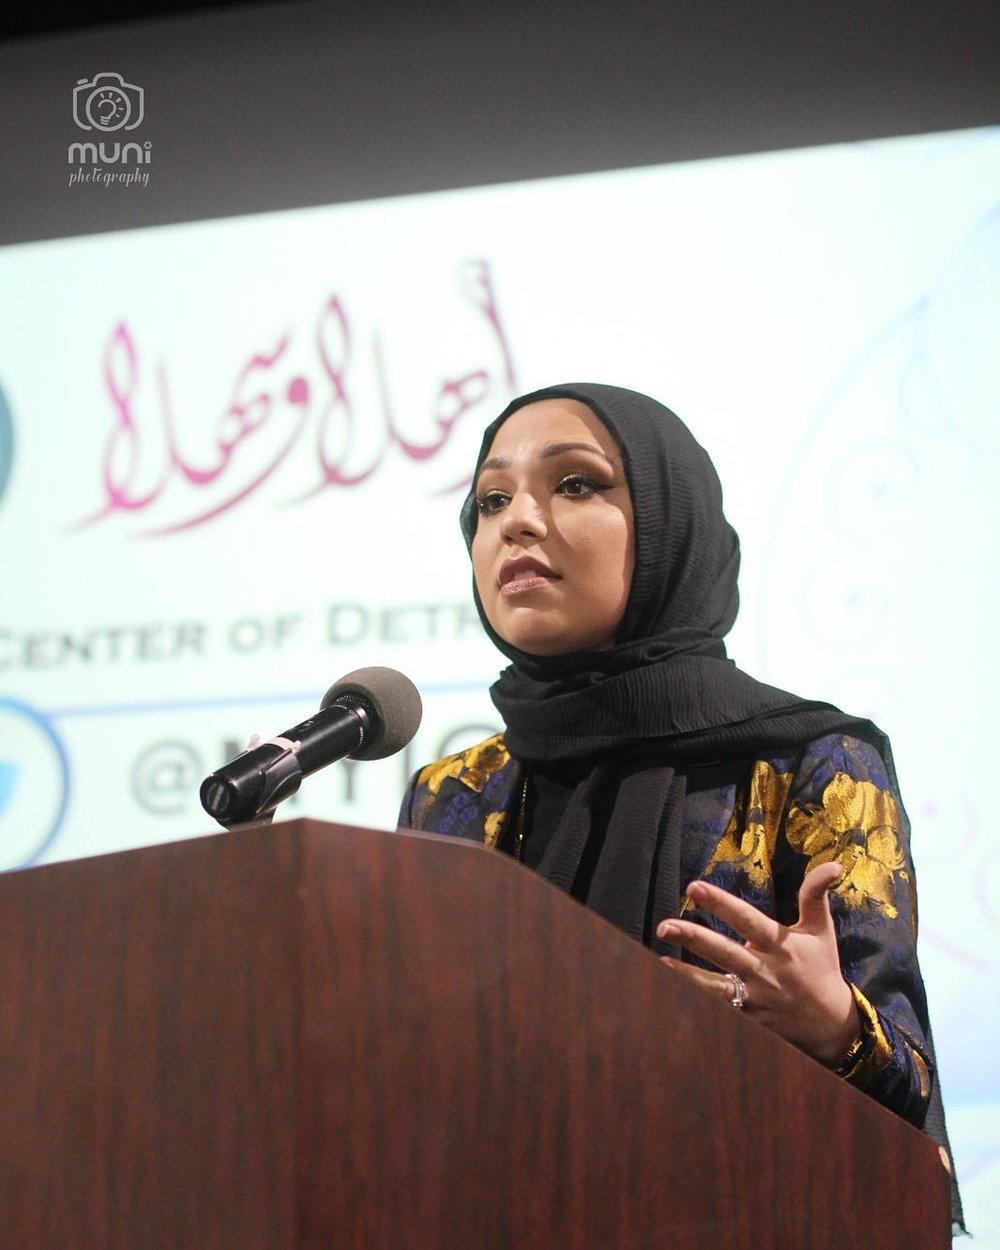 RECENT - HERE'S WHERE ISRA HAS SPOKENNETFLIXGREY'S ANATOMY#FAMILIESBELONGTOGETHER MARCH ON WASHINGTONUNITED NATIONS HUMAN RIGHTS COUNCIL FORUMUNITED NATIONS WOMEN- MALALA X MICROSOFTGLOBAL CLIMATE SUMMITTHE WOMEN'S CONVENTIONSYRIA RELIEF & DEVELOPMENT SPEAKING TOURGLOBAL POLICY INSTITUTEIRUSA BENEFIT RECEPTIONSCAIR NATIONAL CONFERENCEADC NATIONAL CONFERENCEMUSLIM WOMEN FOR RETREATUNITED NATIONS RELIEF WORKS AGENCY USA BENEFITSGEORGETOWN UNIVERSITYUNIVERSITY OF MASSACHUSETTS AMHERSTUNIVERSITY OF THE SOUTHUNIVERSITY OF FLORIDAFORDHAM UNIVERSITYJOHN JAY COLLEGEGEORGE MASON UNIVERSITYAMERICAN UNIVERSITYUNIVERSITY OF MARYLAND BALTIMOREUNIVERSITY OF MARYLAND COLLEGE PARKCALIFORNIA STATE UNIVERSITYQUINNIPIAC UNIVERSITYPIERCE COLLEGEPFH ANNUAL CONVENTIONMODEST FASHION WEEK - JAKARTA, INDONESIAMODEST FASHION WEEK- DUBAI, UAE